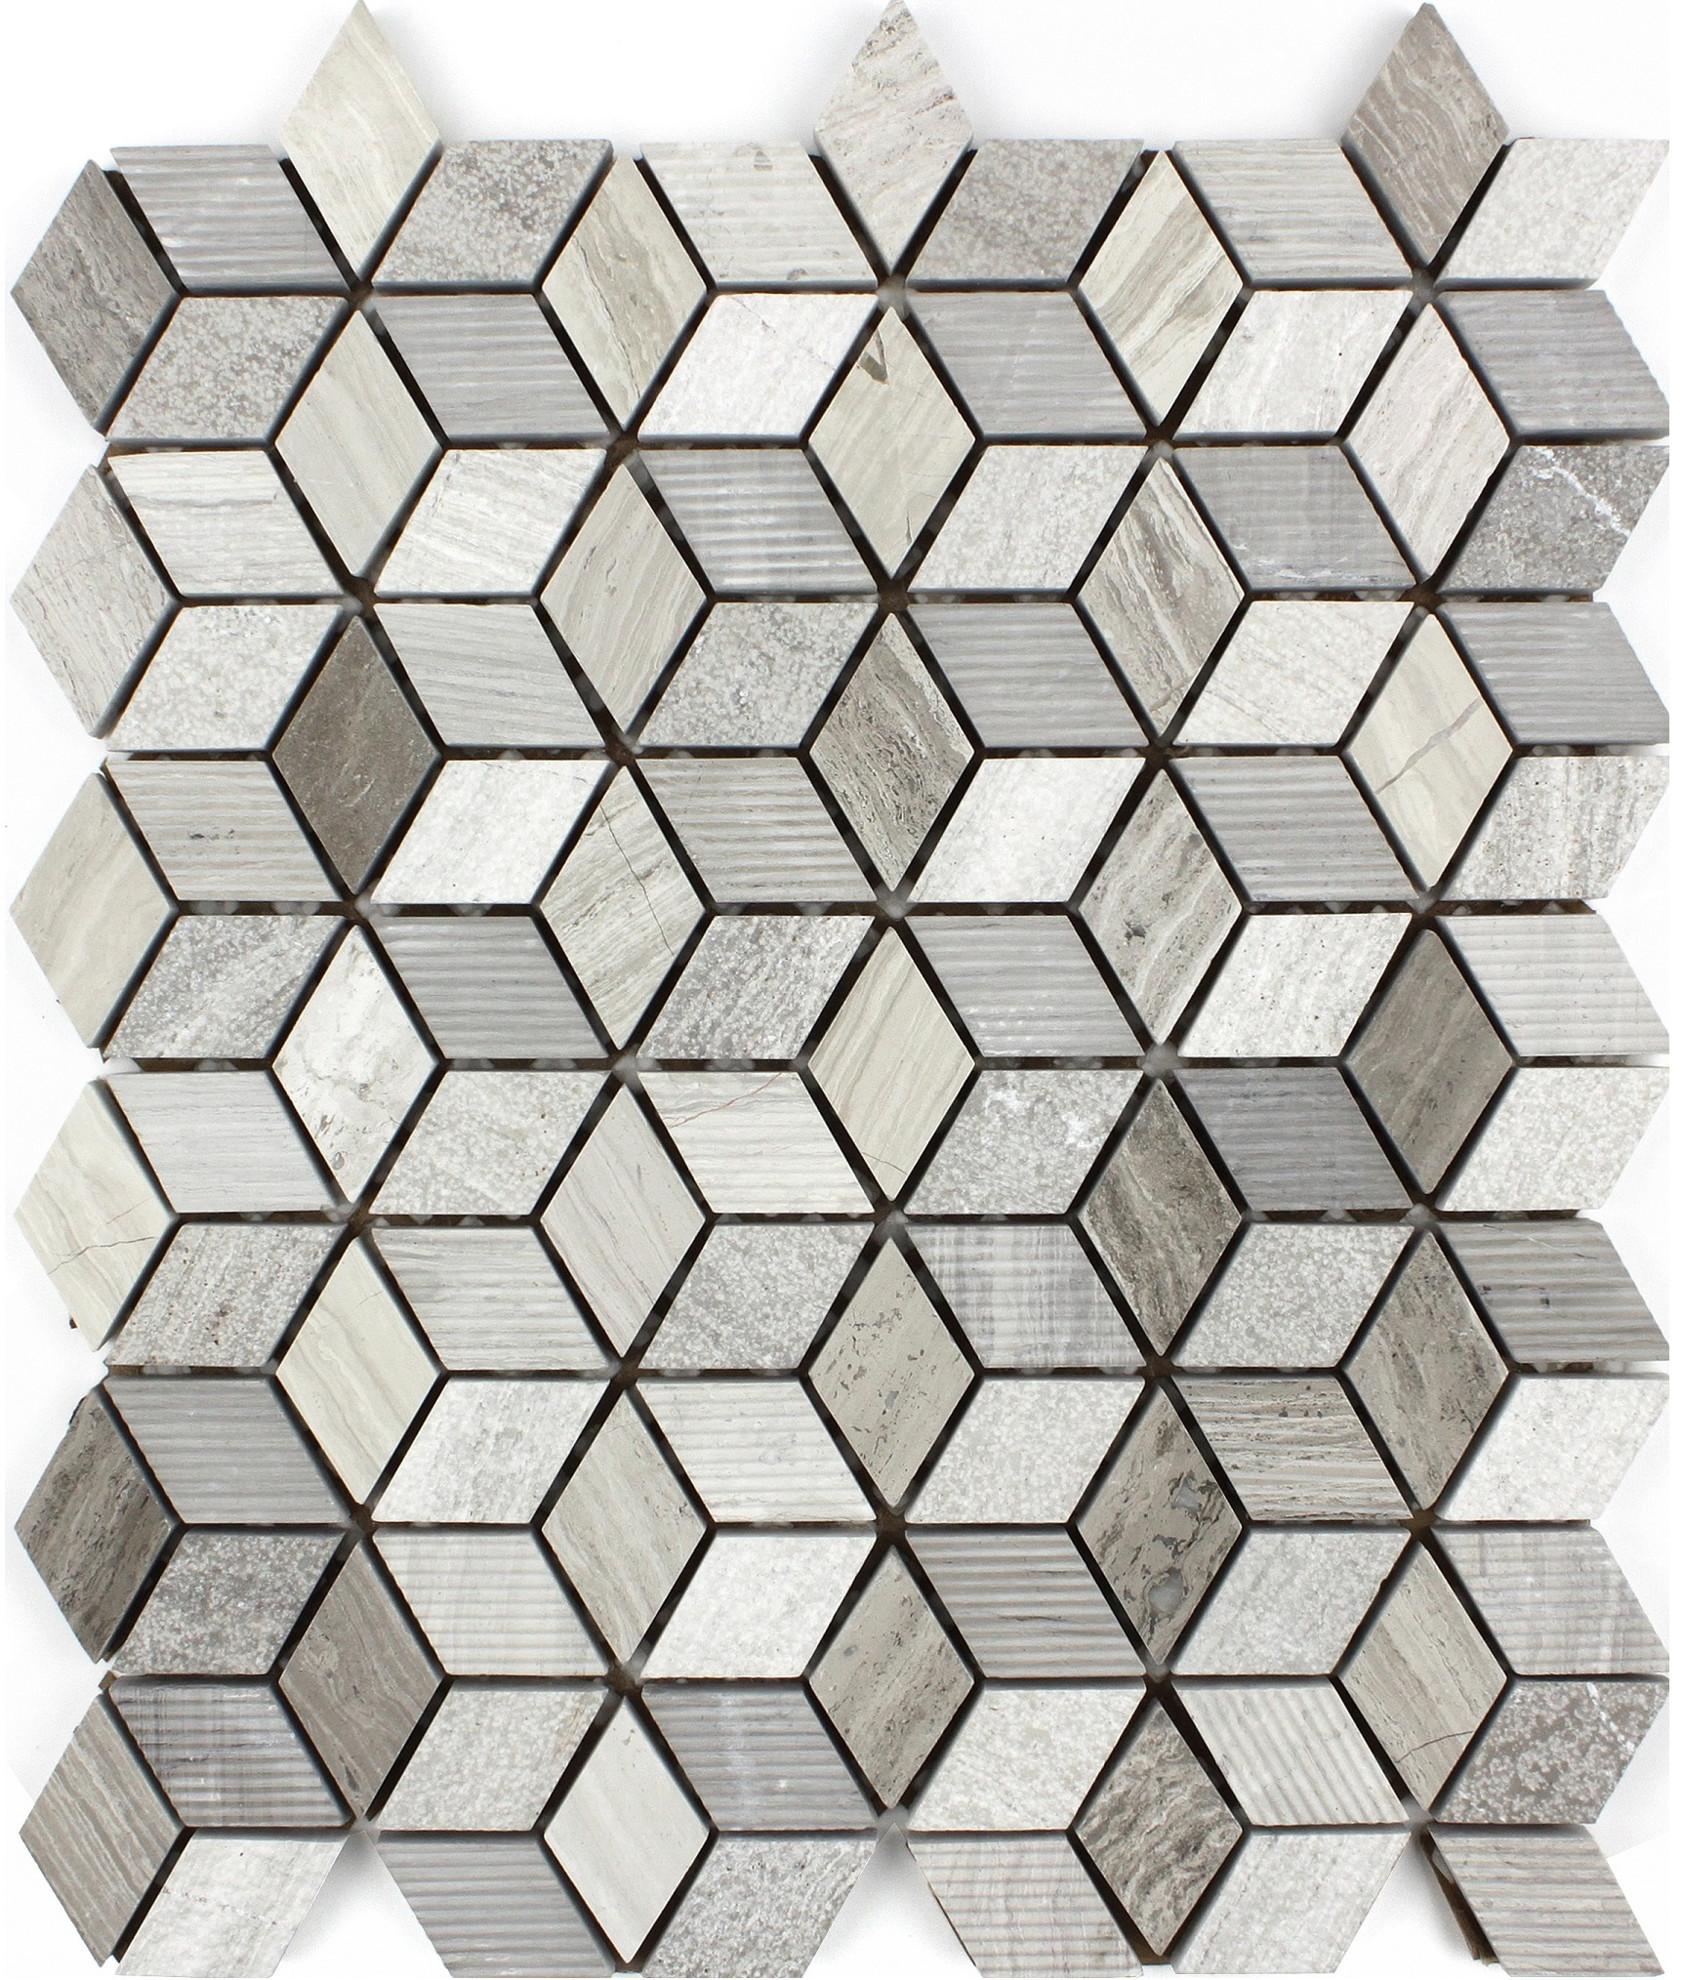 Imagine Mozaic MST08-XX-033